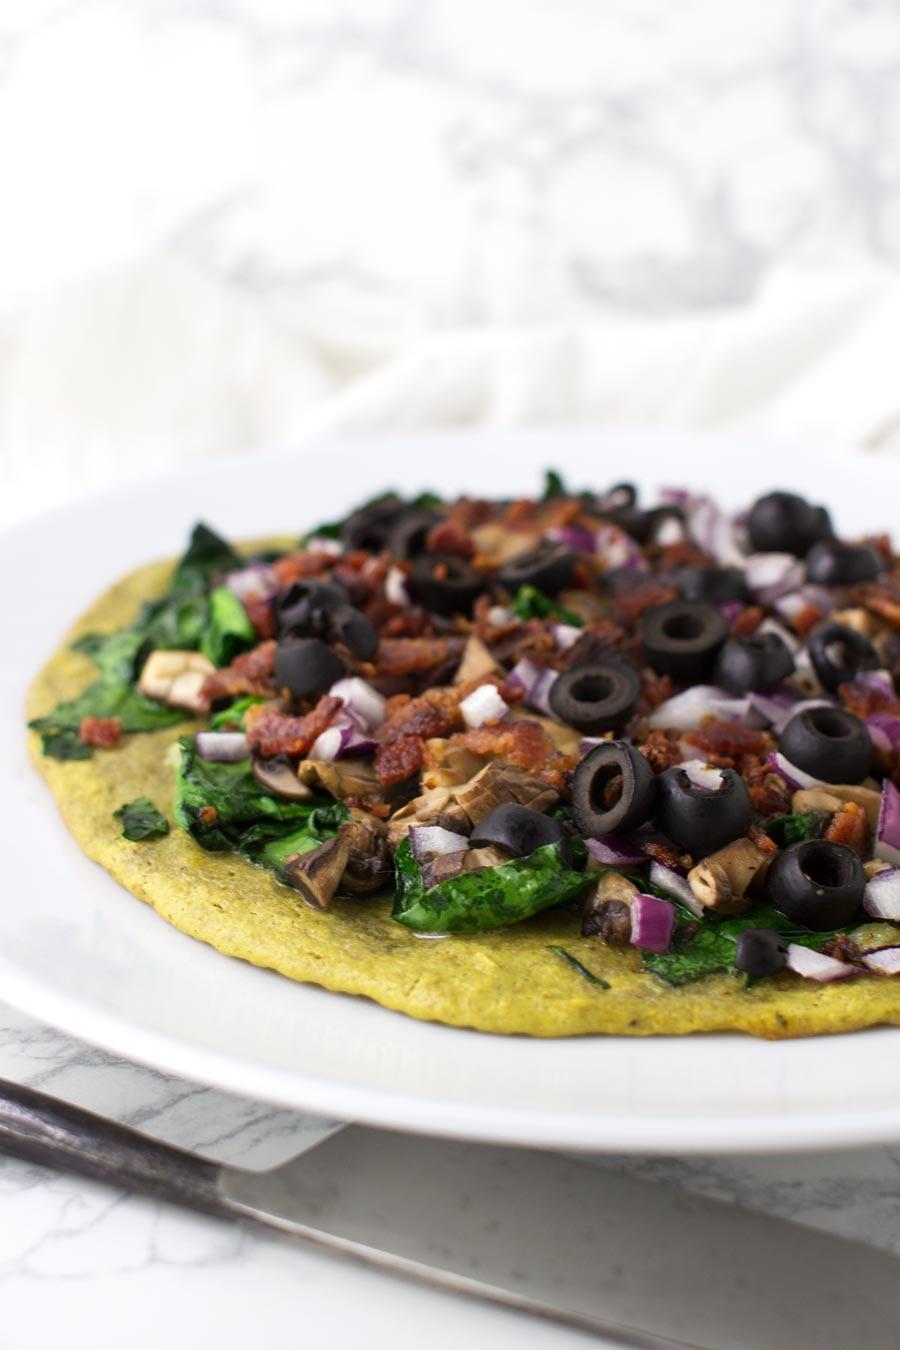 Margherita Pizza recipe from acleanplate.com #aip #paleo #glutenfree